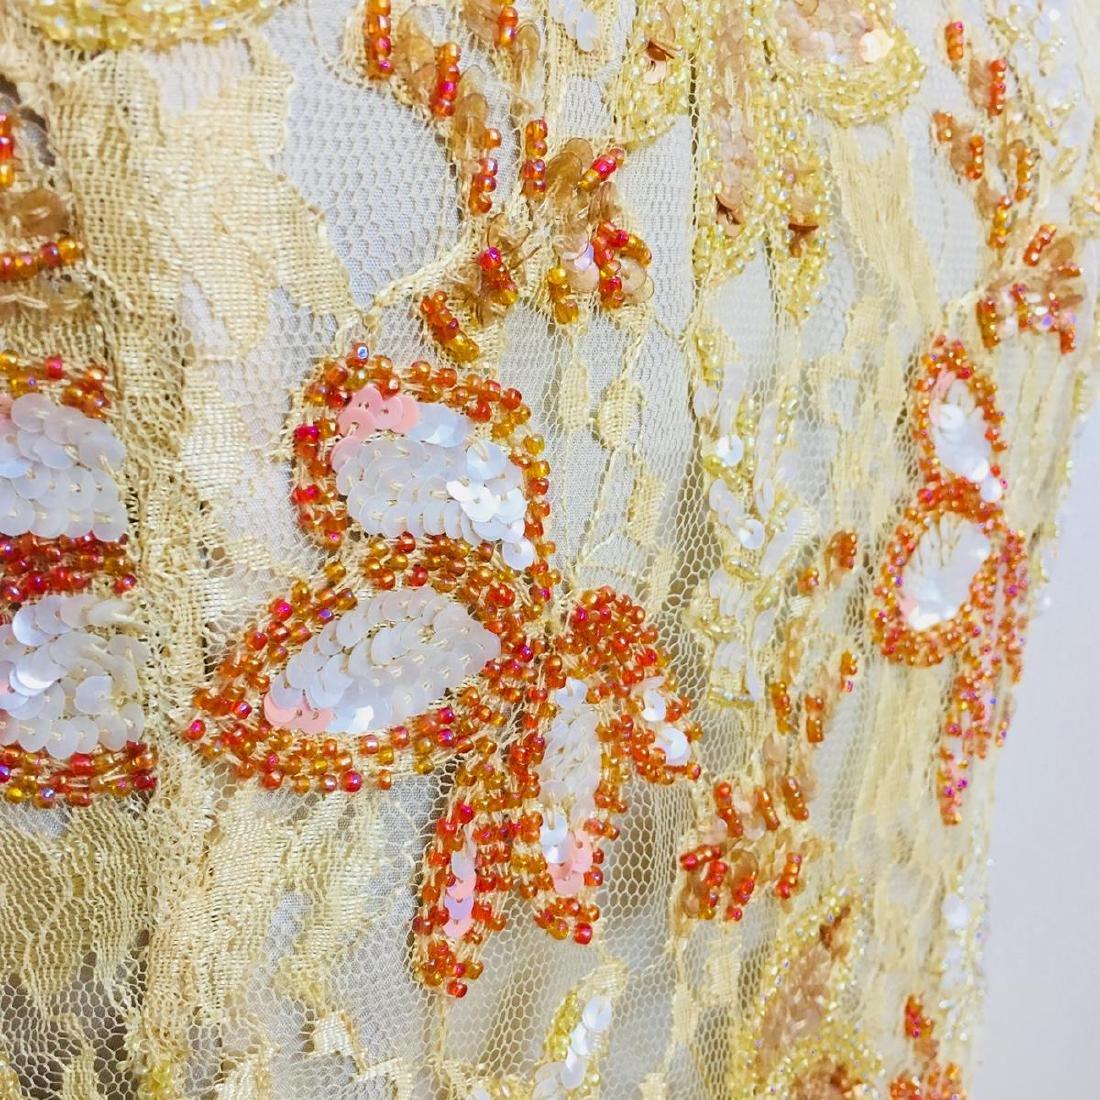 Vintage Women's Collection Designer Blouse Shirt Top - 3